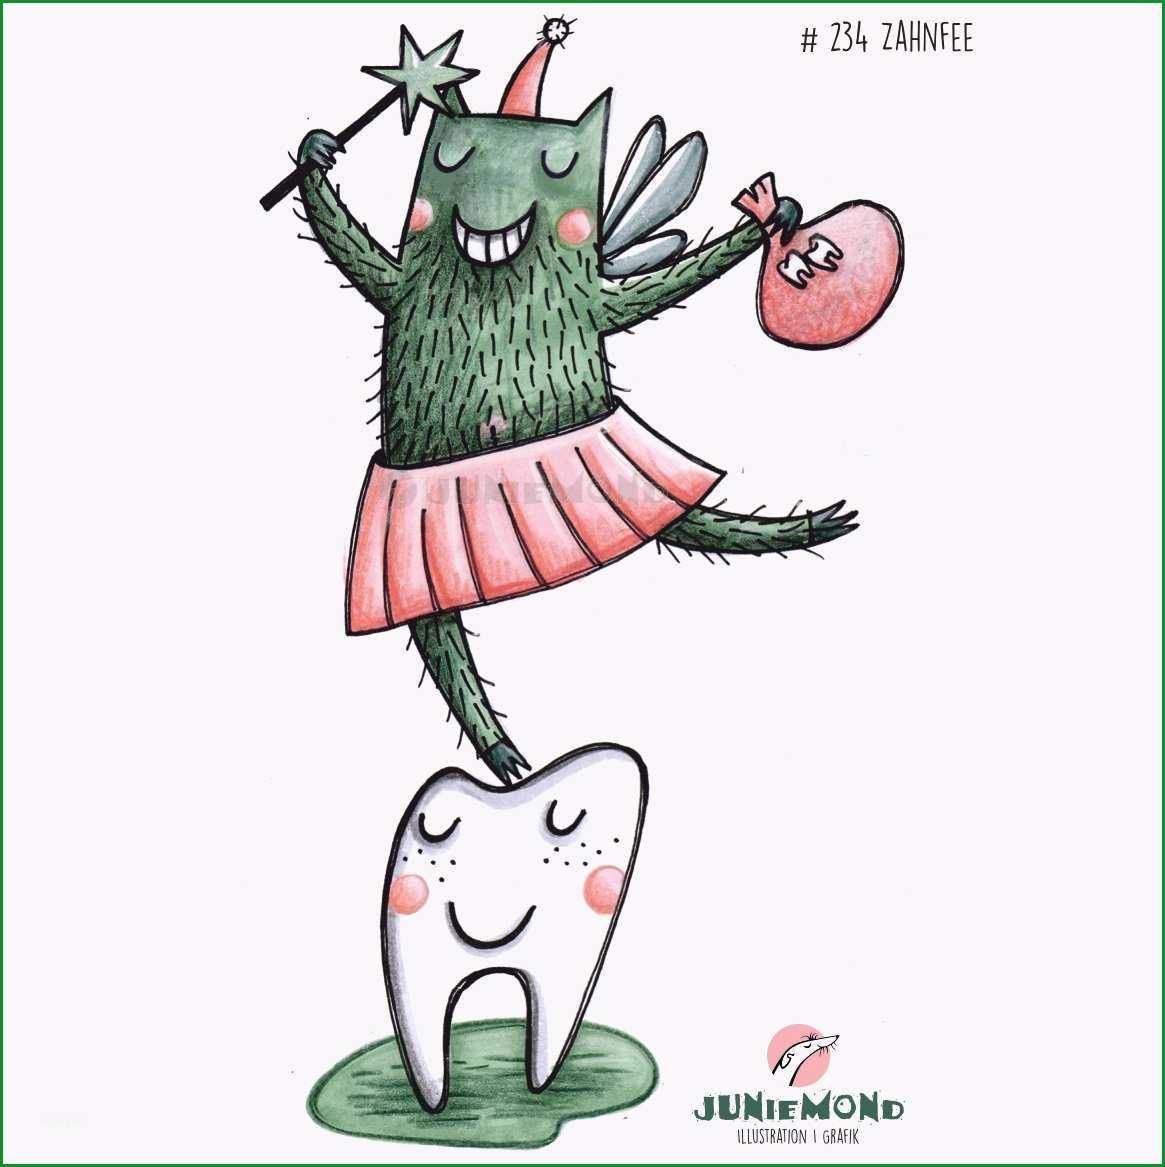 Zahn Fee Brief Zahnfee Zertifikat Zahnfee Zahn erste Zahn t